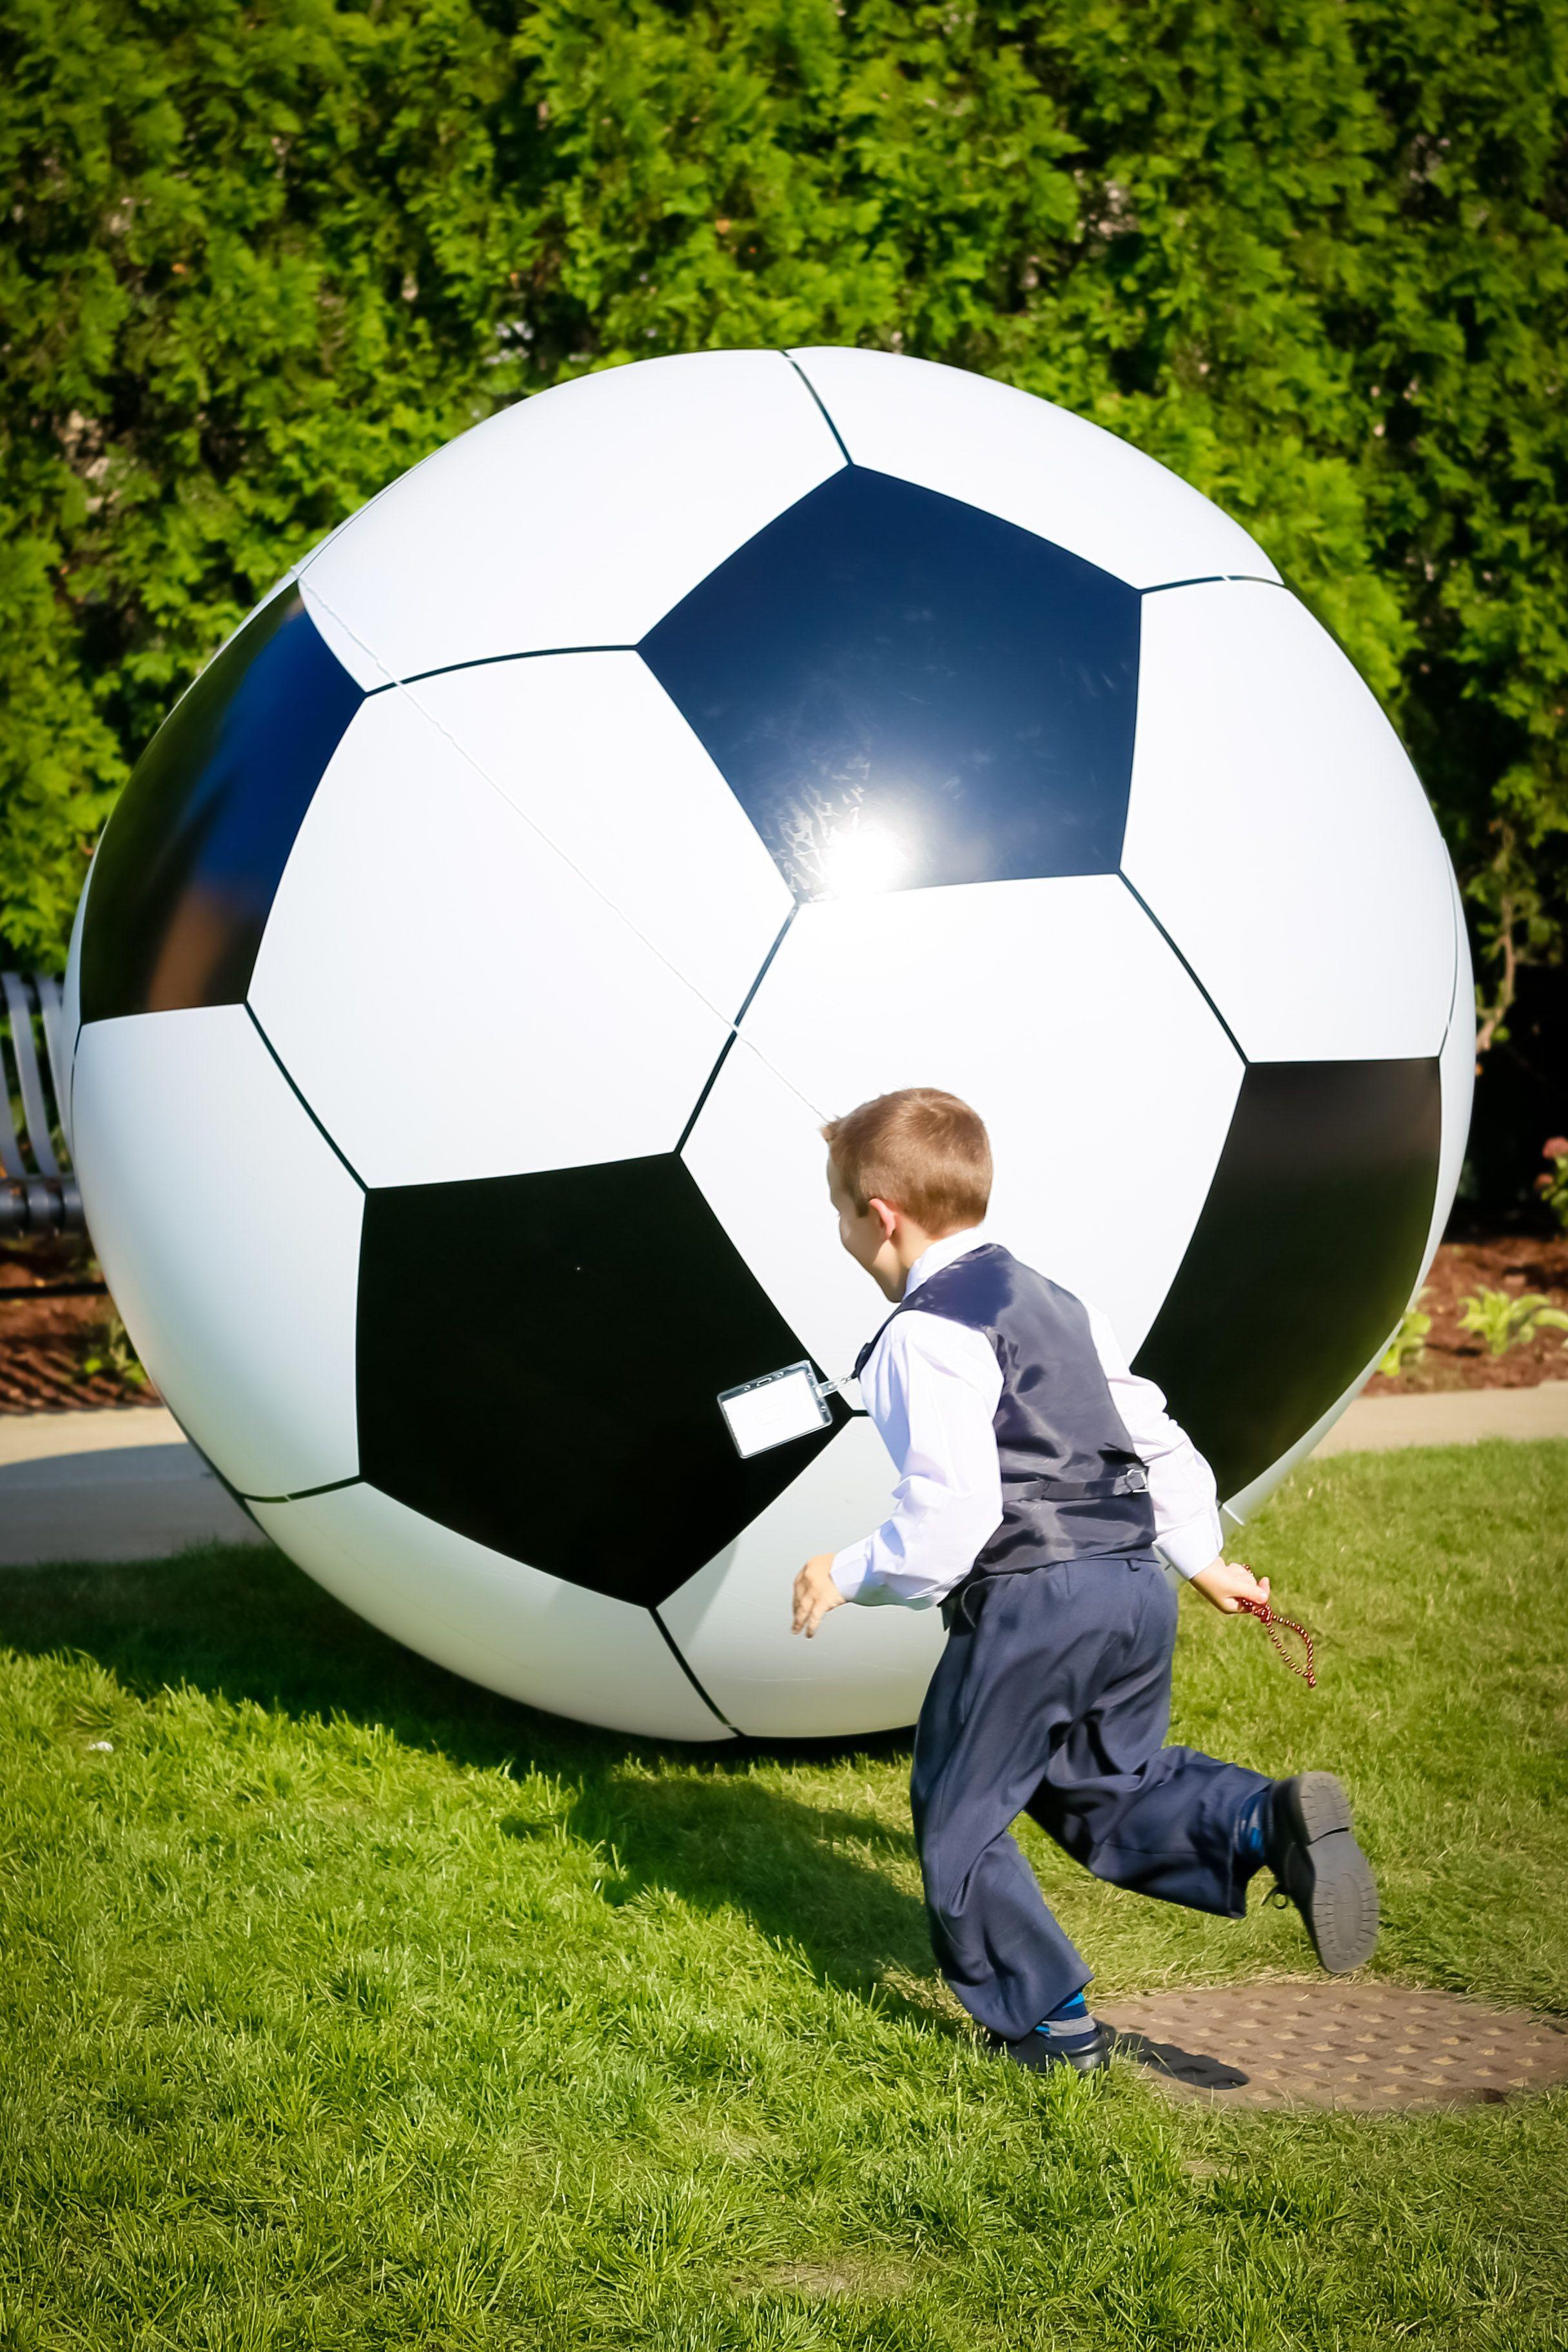 Soccer Ball Vase Of Ccs Ballroomdata Csv at Master A· Aliceykuo Ccs A· Github In 069bf026884bf90c7269c59eec5a9927